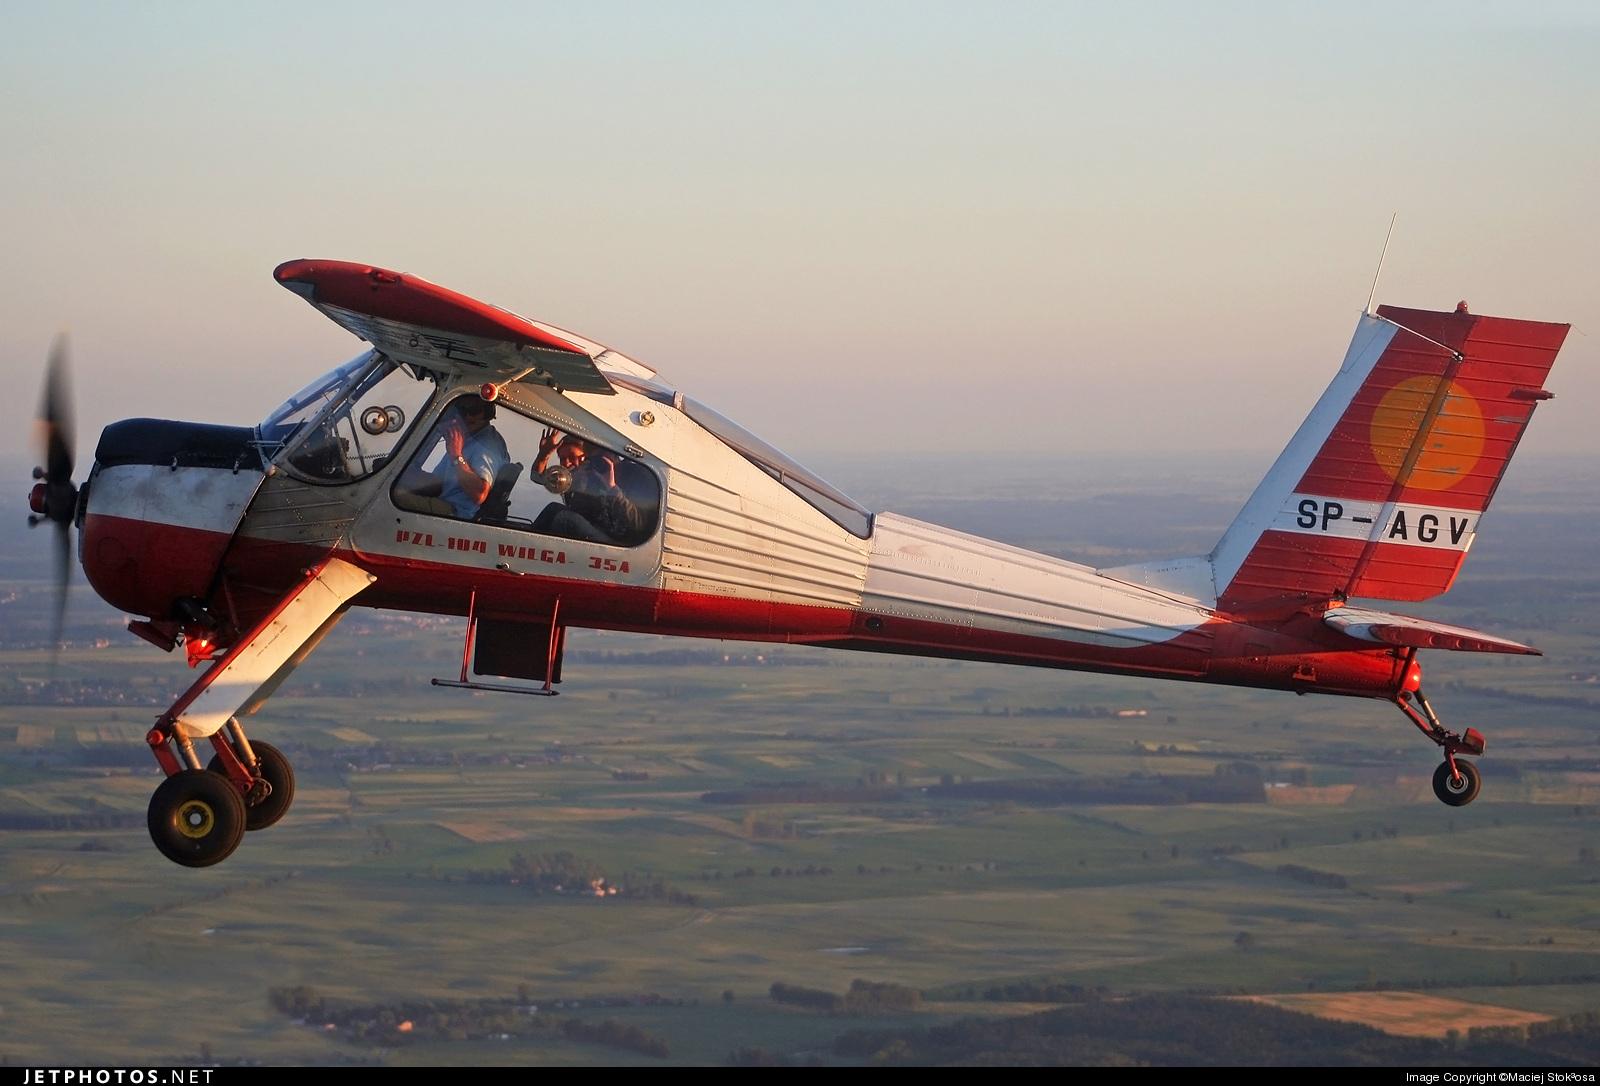 SP-AGV - PZL-Okecie 104 Wilga 35A - Aero Club - Bydgoski